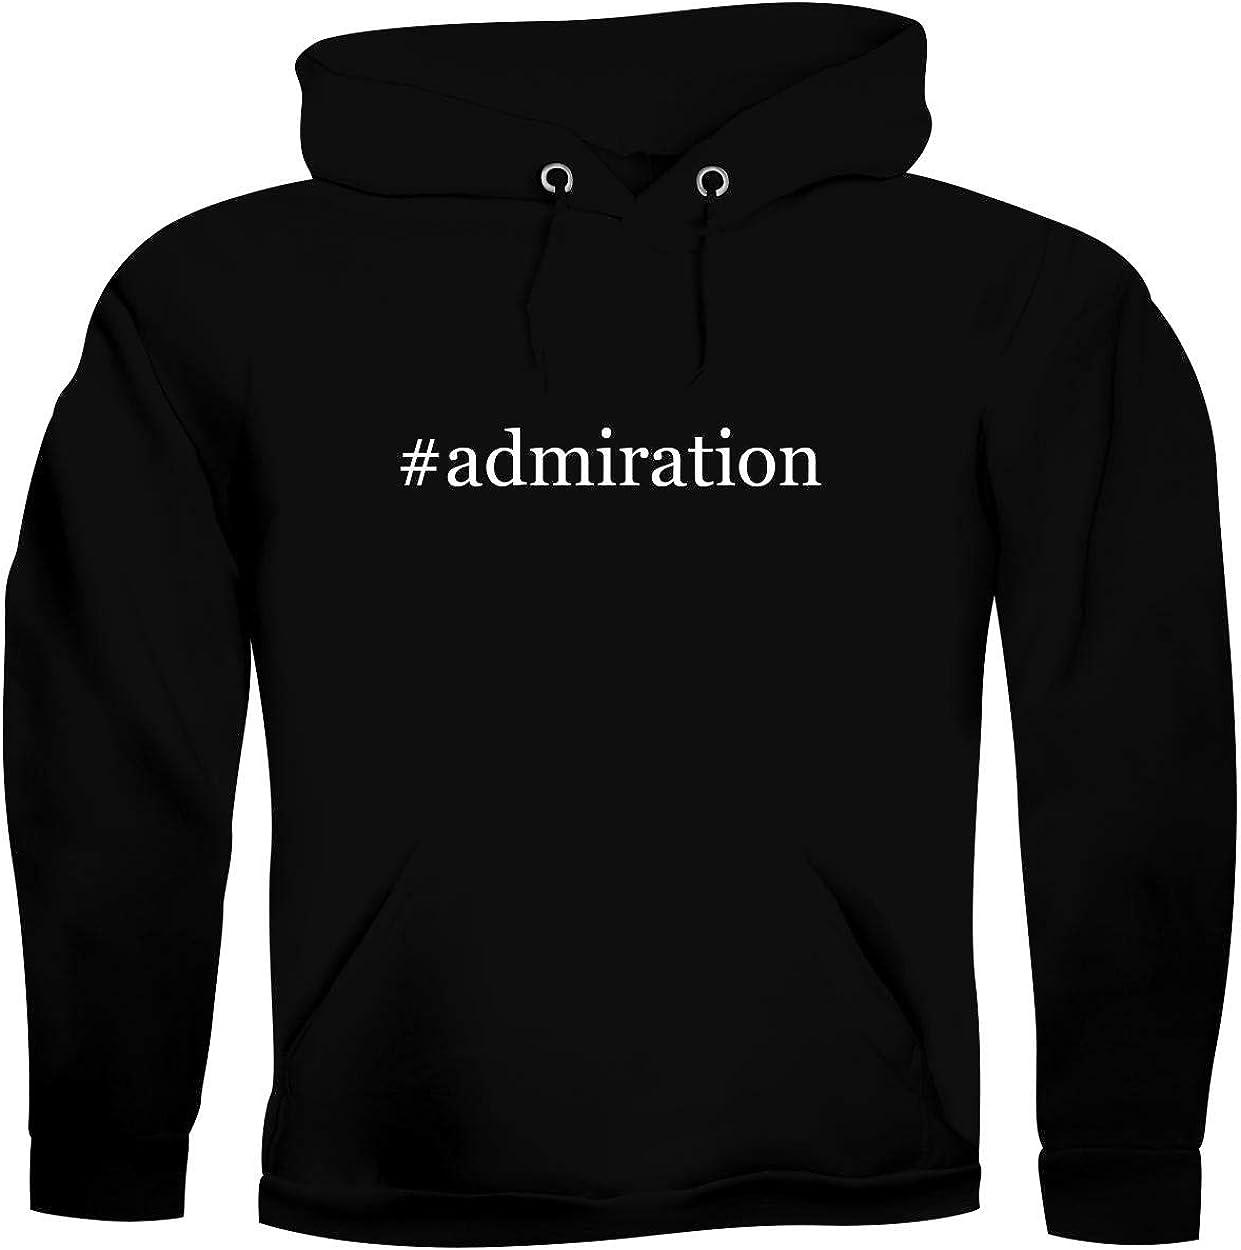 #admiration - Men's Hashtag Ultra Soft Hoodie Sweatshirt